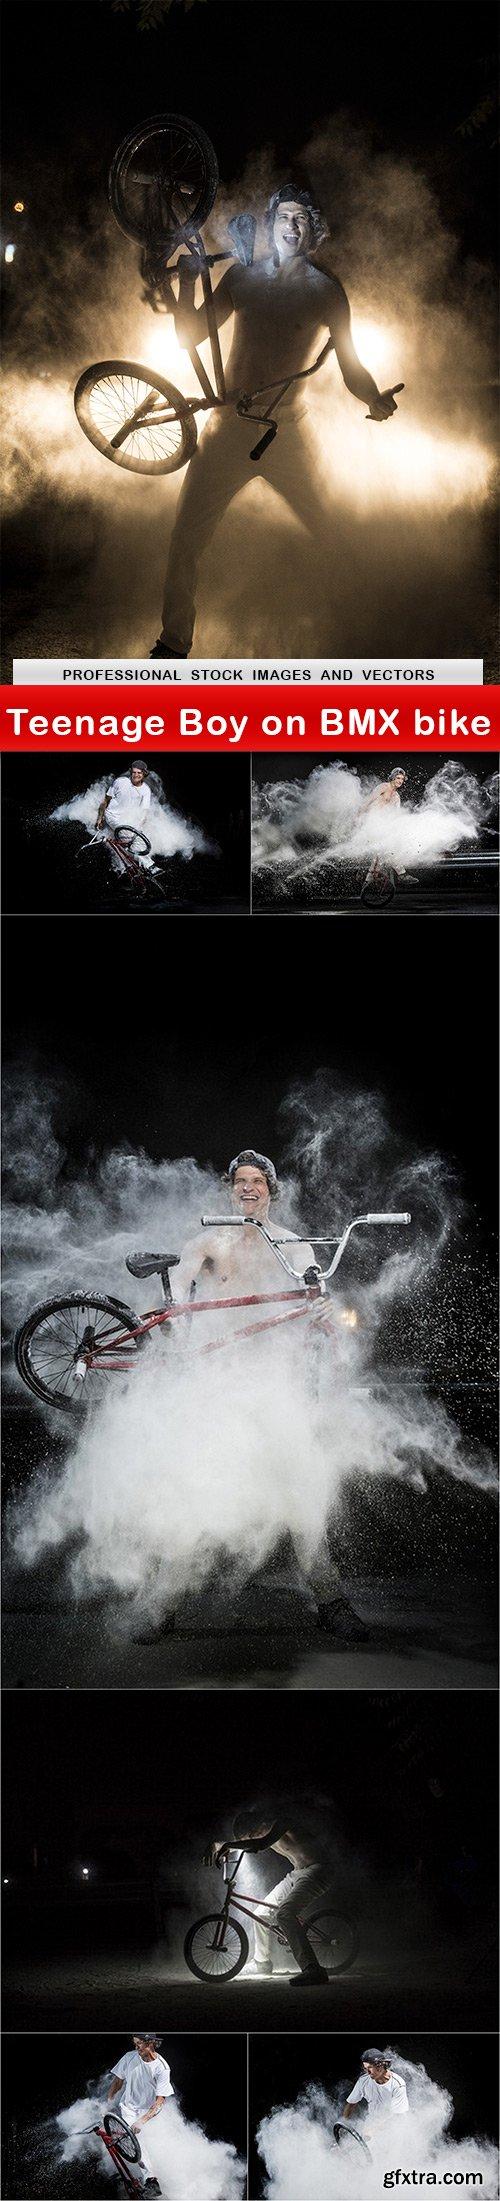 Teenage Boy on BMX bike - 7 UHQ JPEG